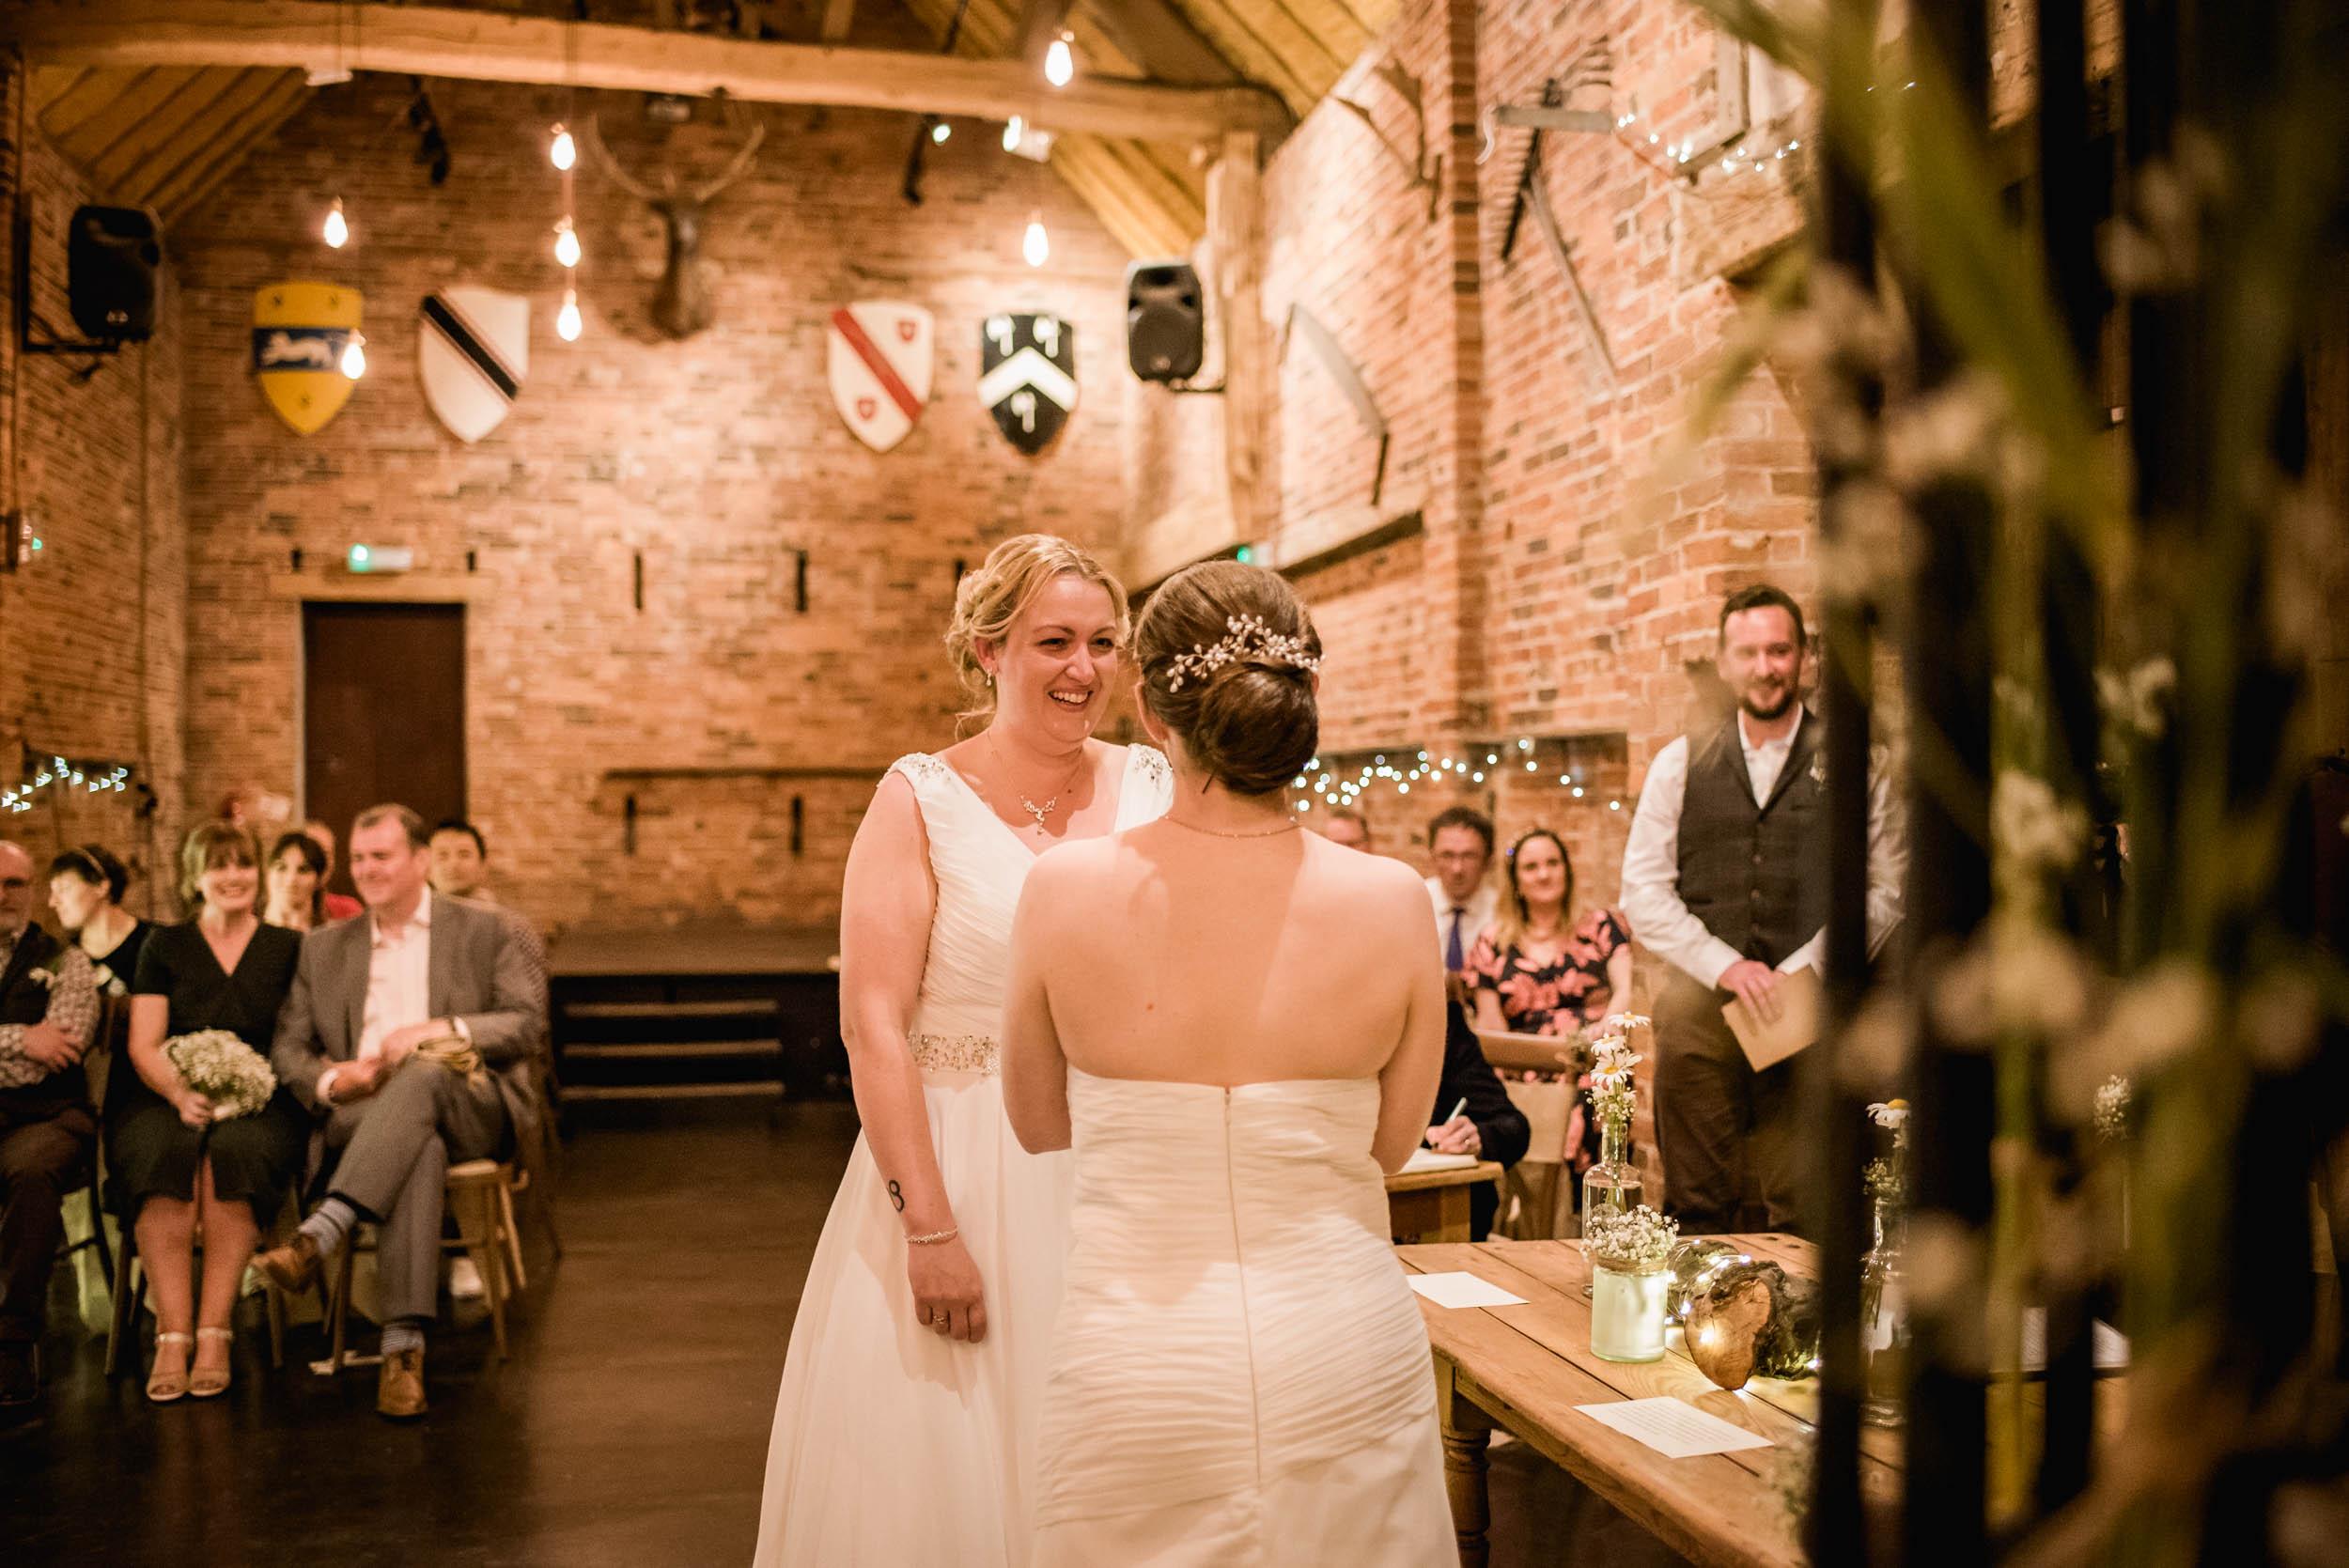 Donington-park-farm-wedding-photography-155.jpg